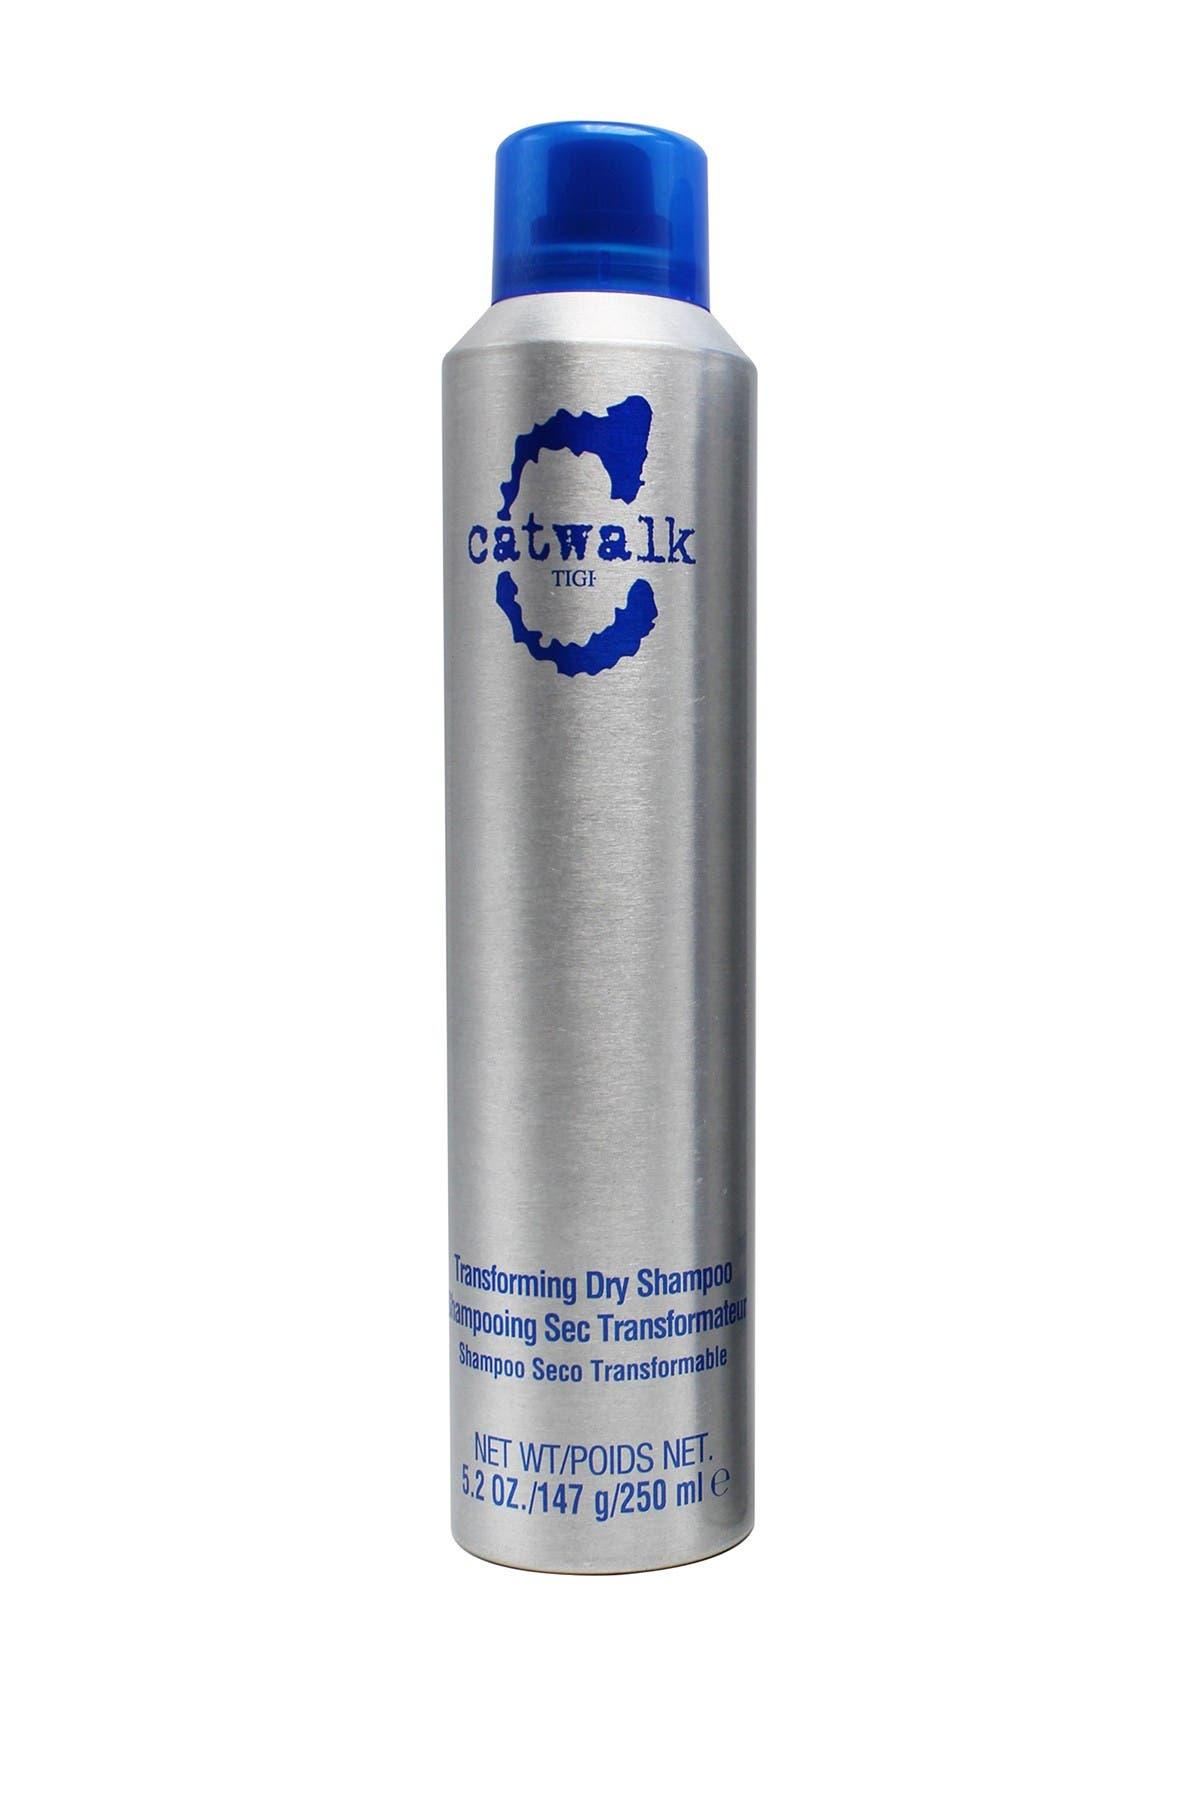 Image of TIGI Catwalk Tigi Transforming Dry Shampoo